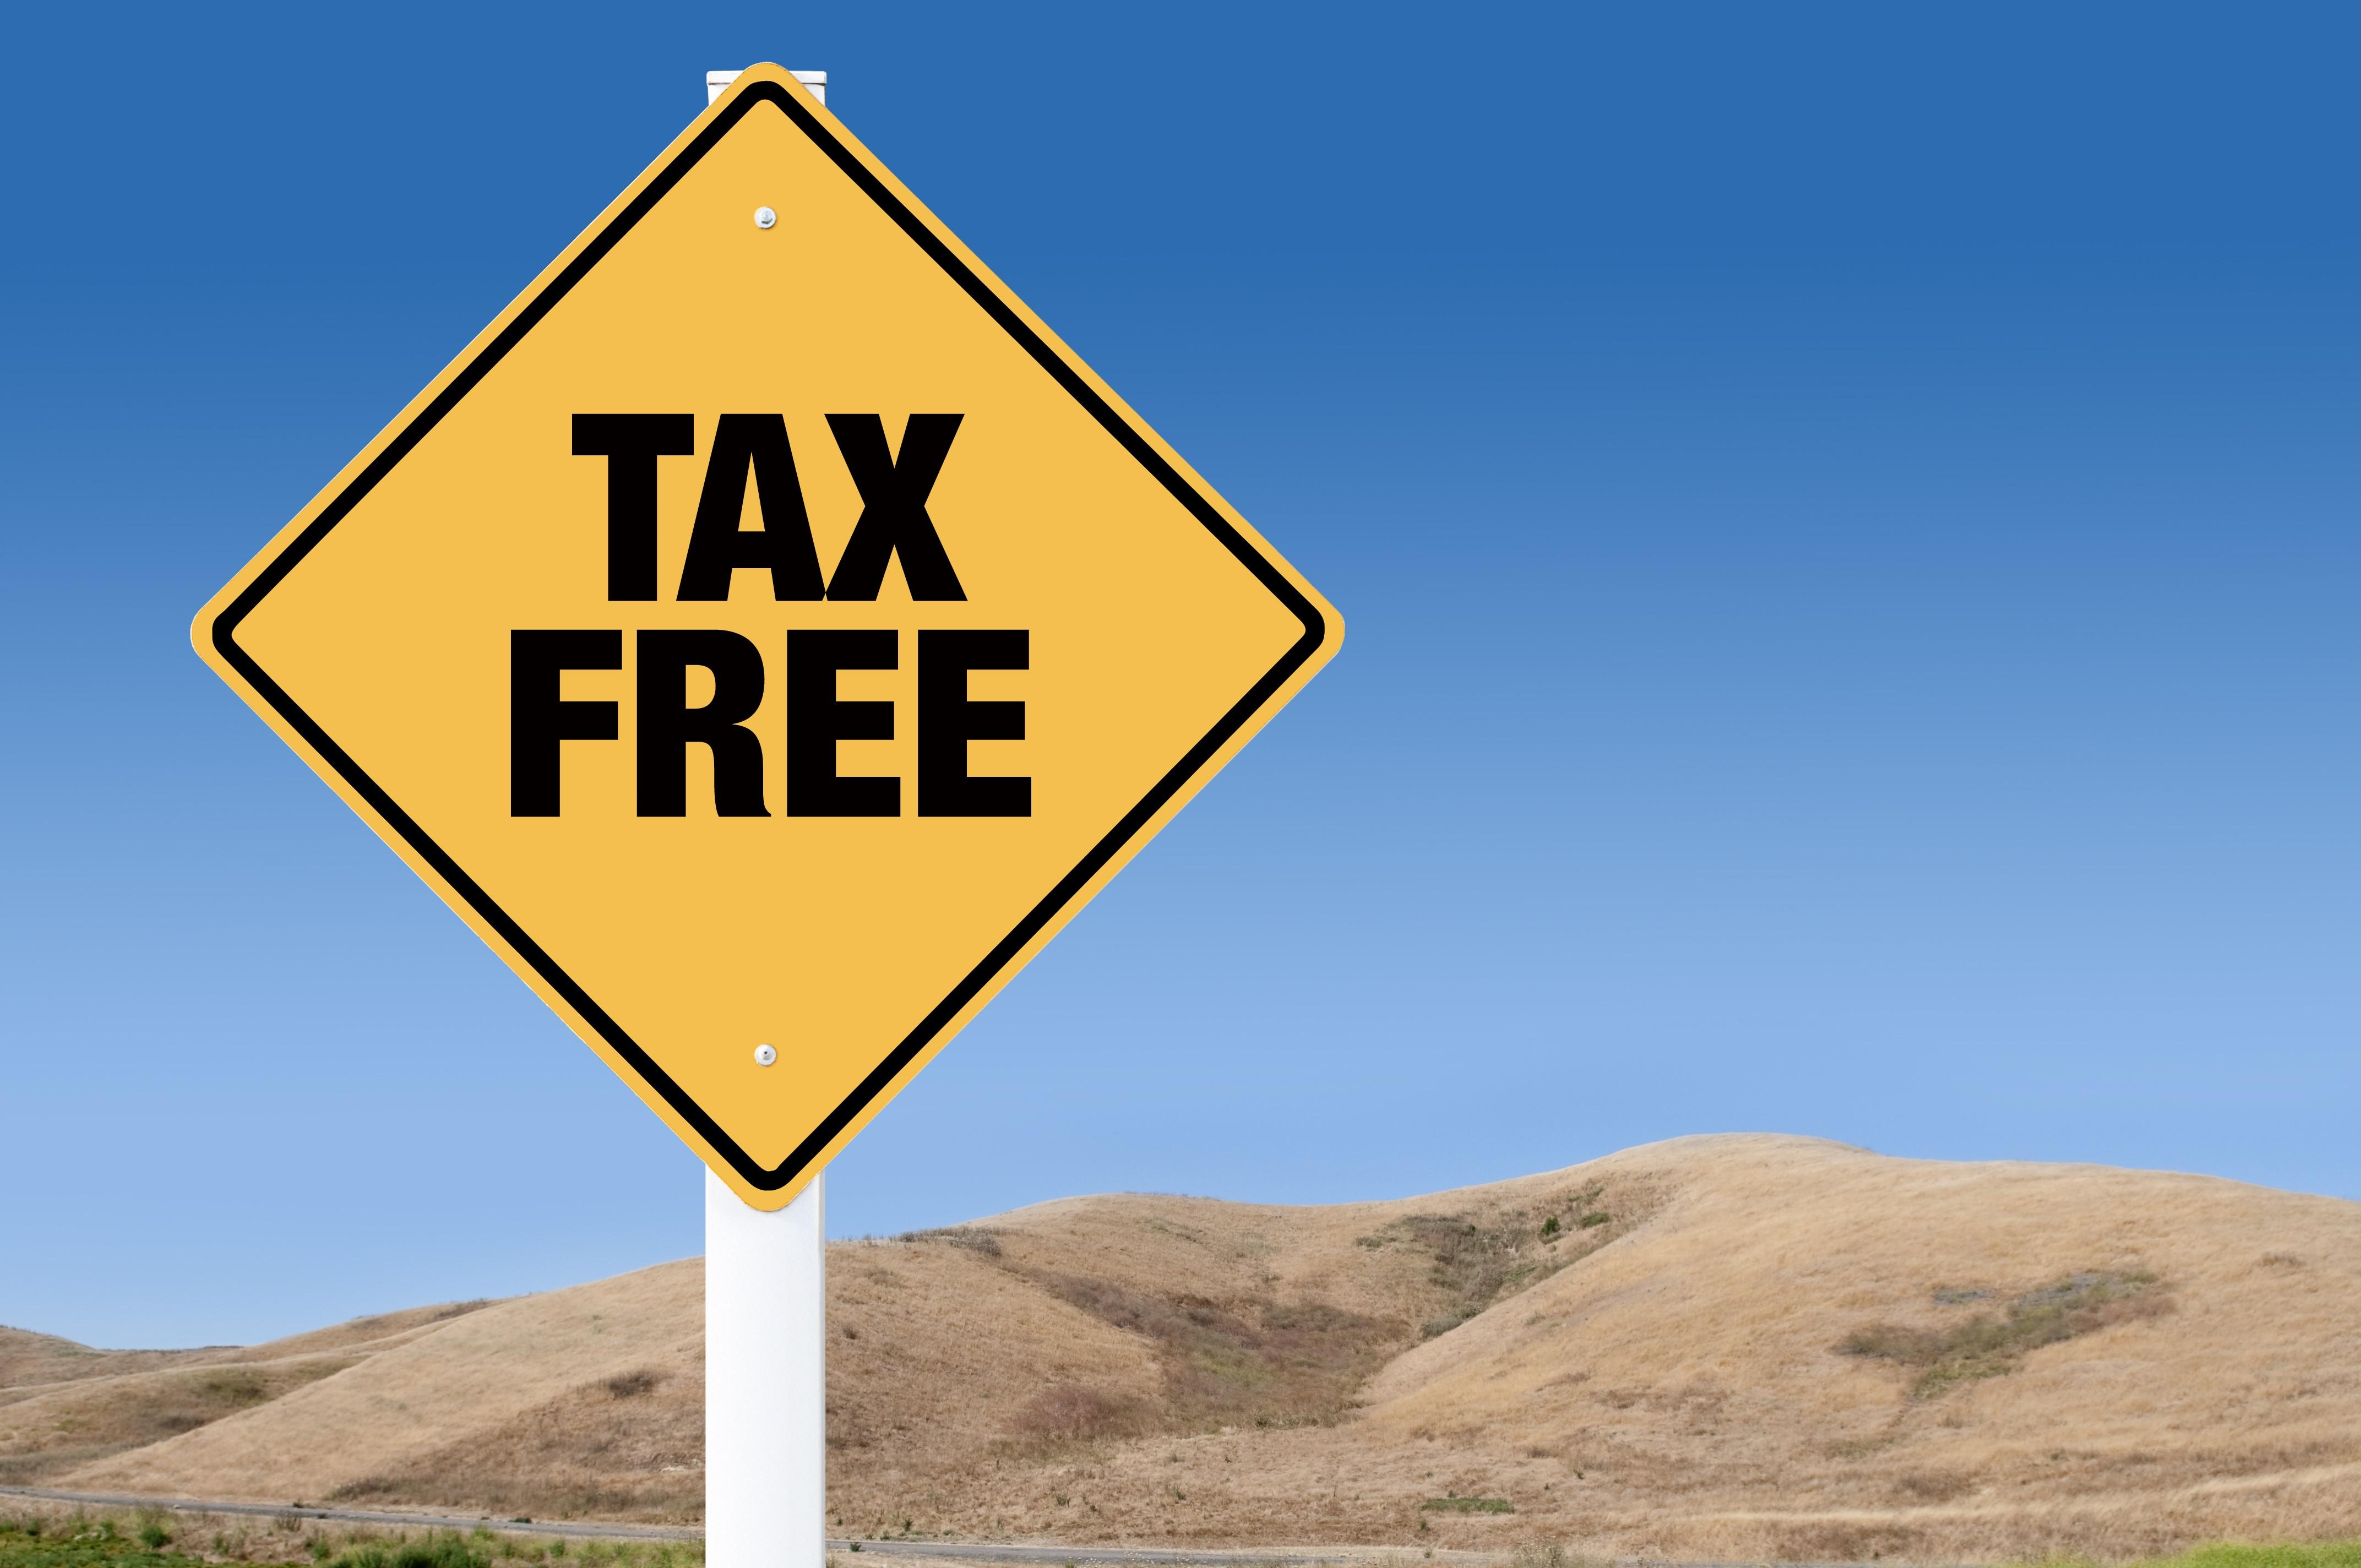 Overseas buyers now exempt from VAT on Turkish property